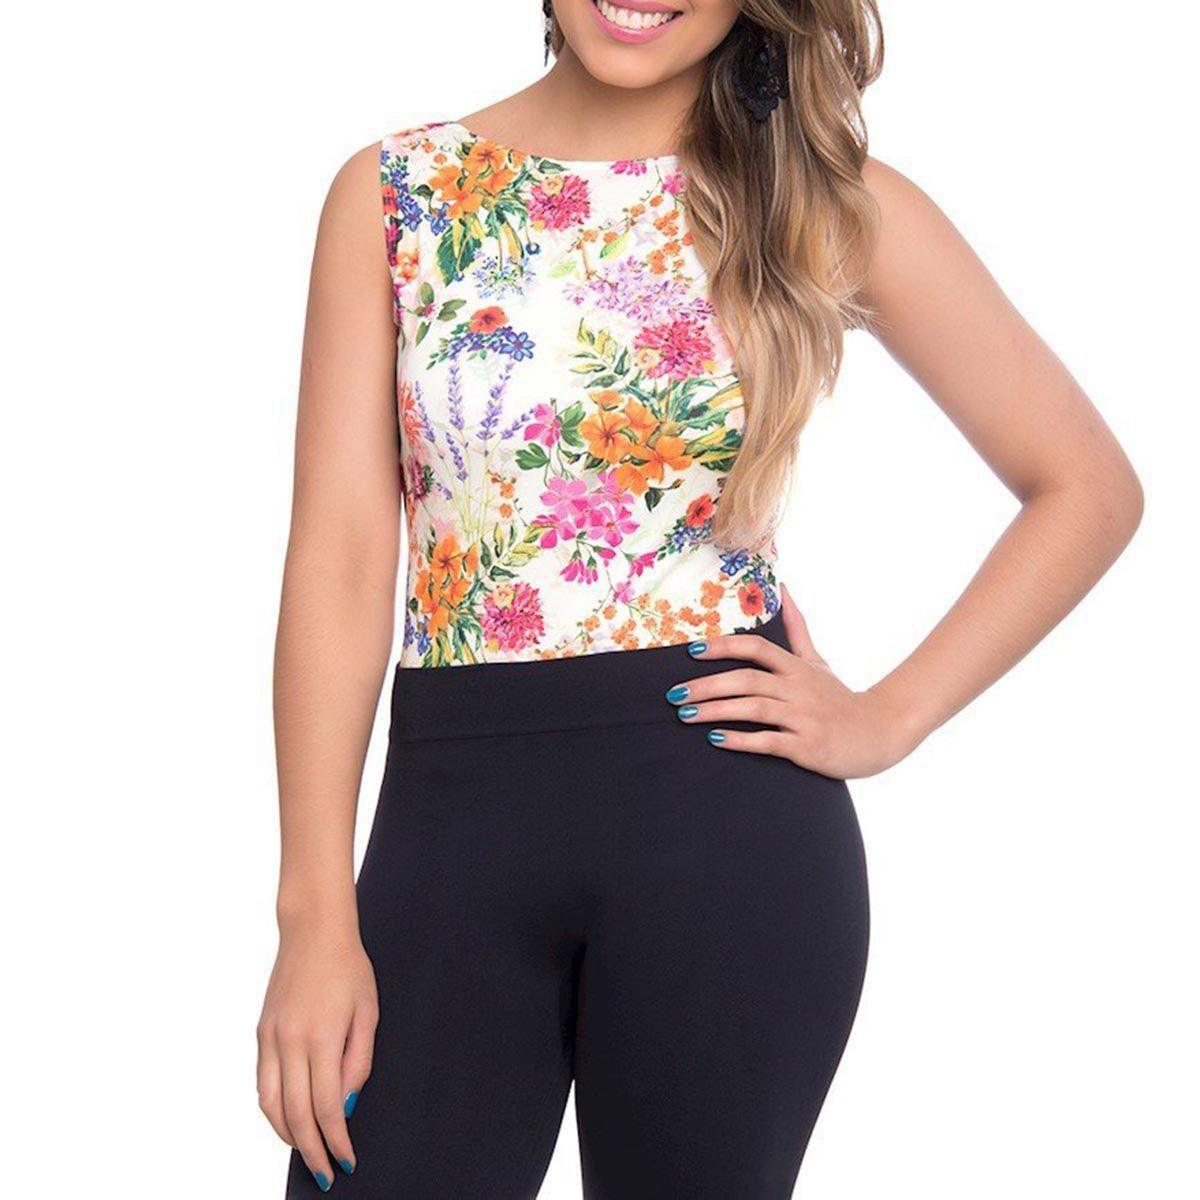 Body Regata Lupo Loba Trend 47006 Fit Casual Estampa Floral